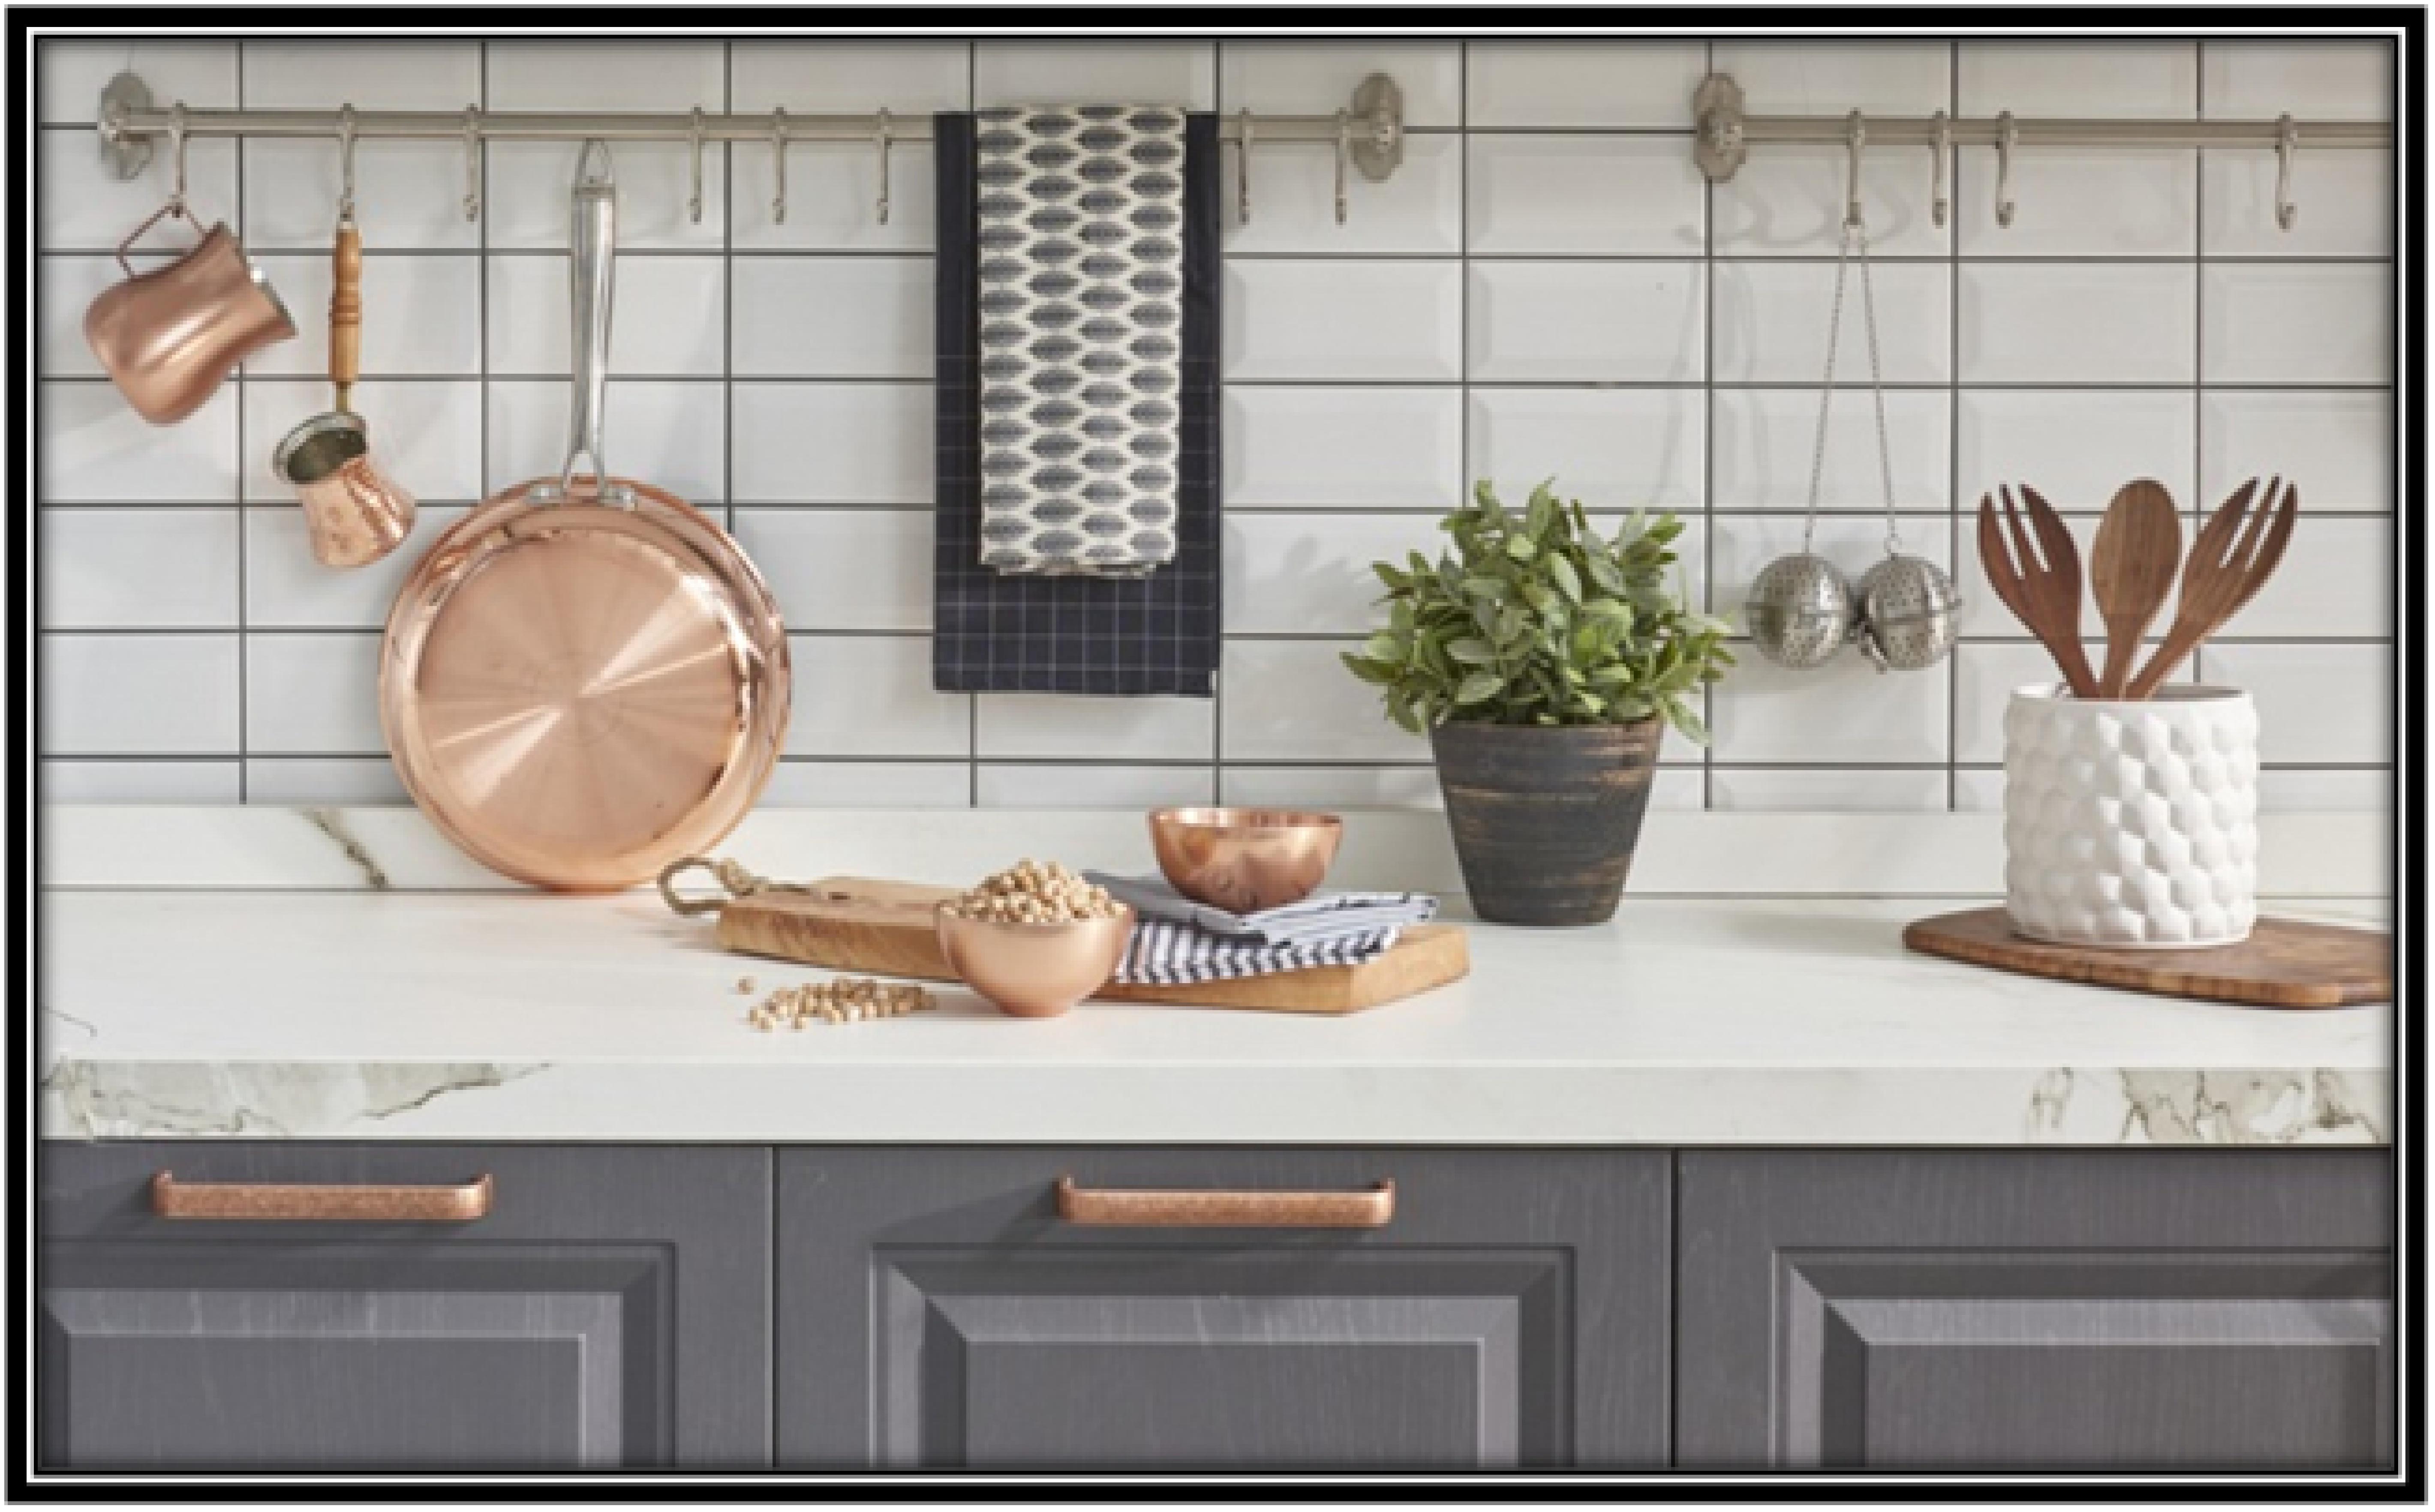 Accessories for kitchen - Home Decor Ideas